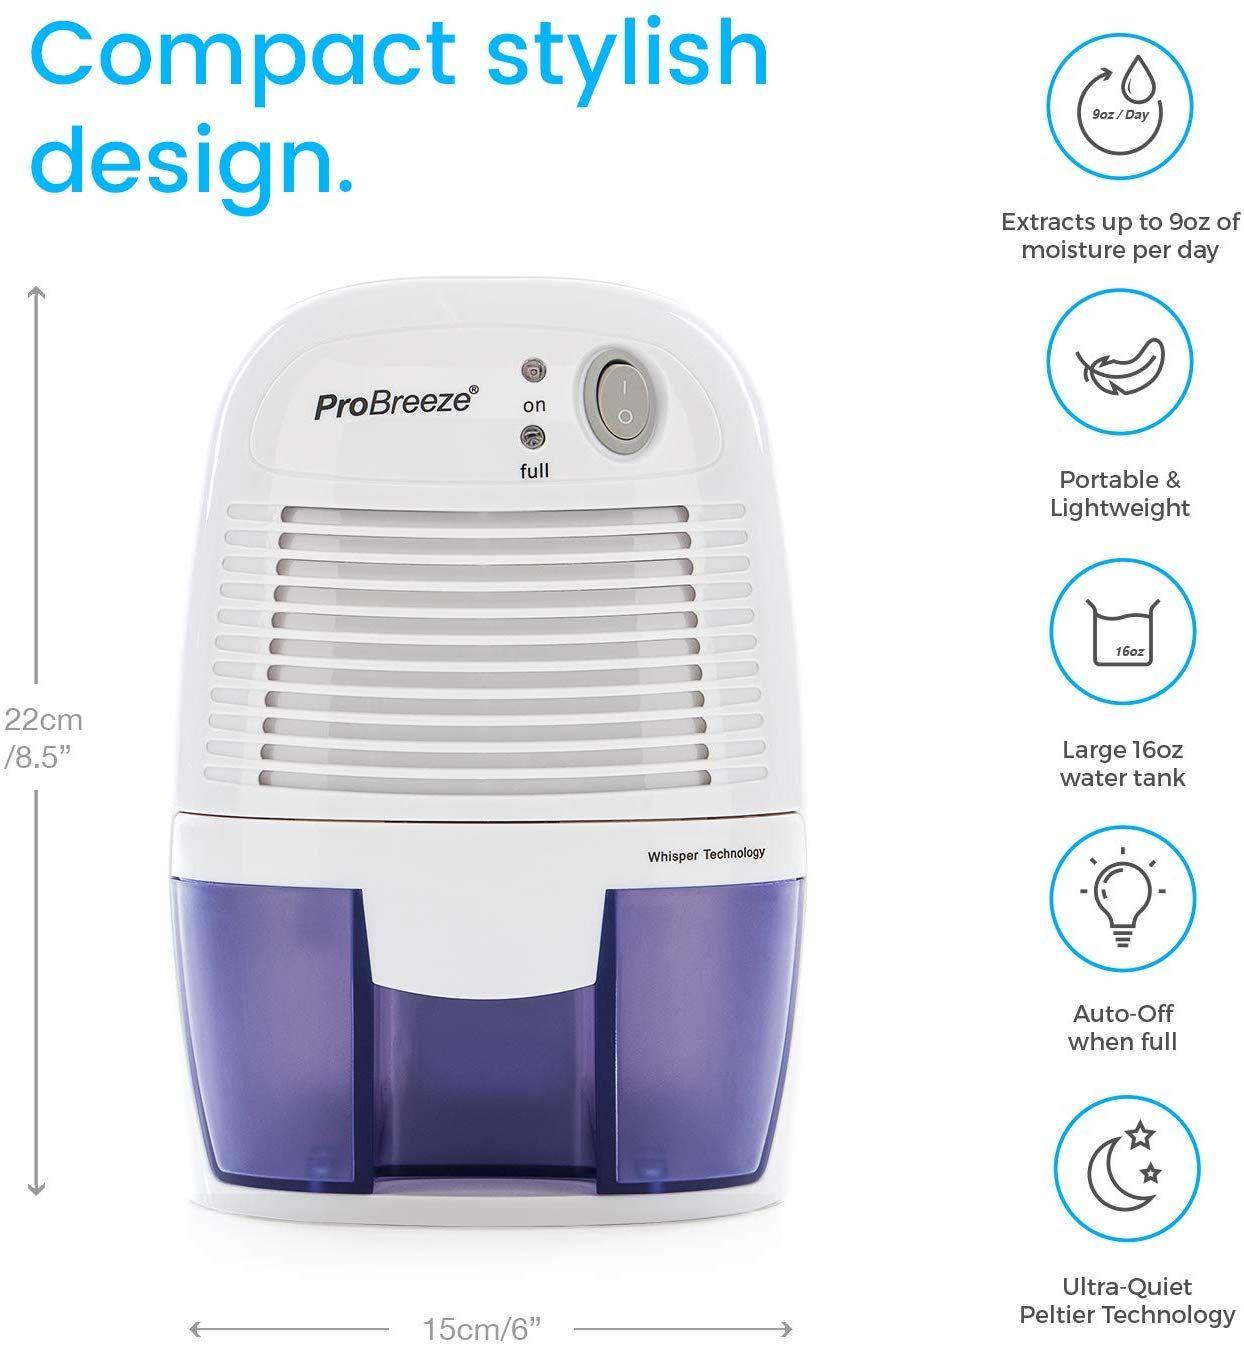 Home Kitchen Bedroom Bathroom Basement Caravan Office Rv Garage With Auto Shut Off In 2020 Mini Dehumidifier Dehumidifiers High Humidity